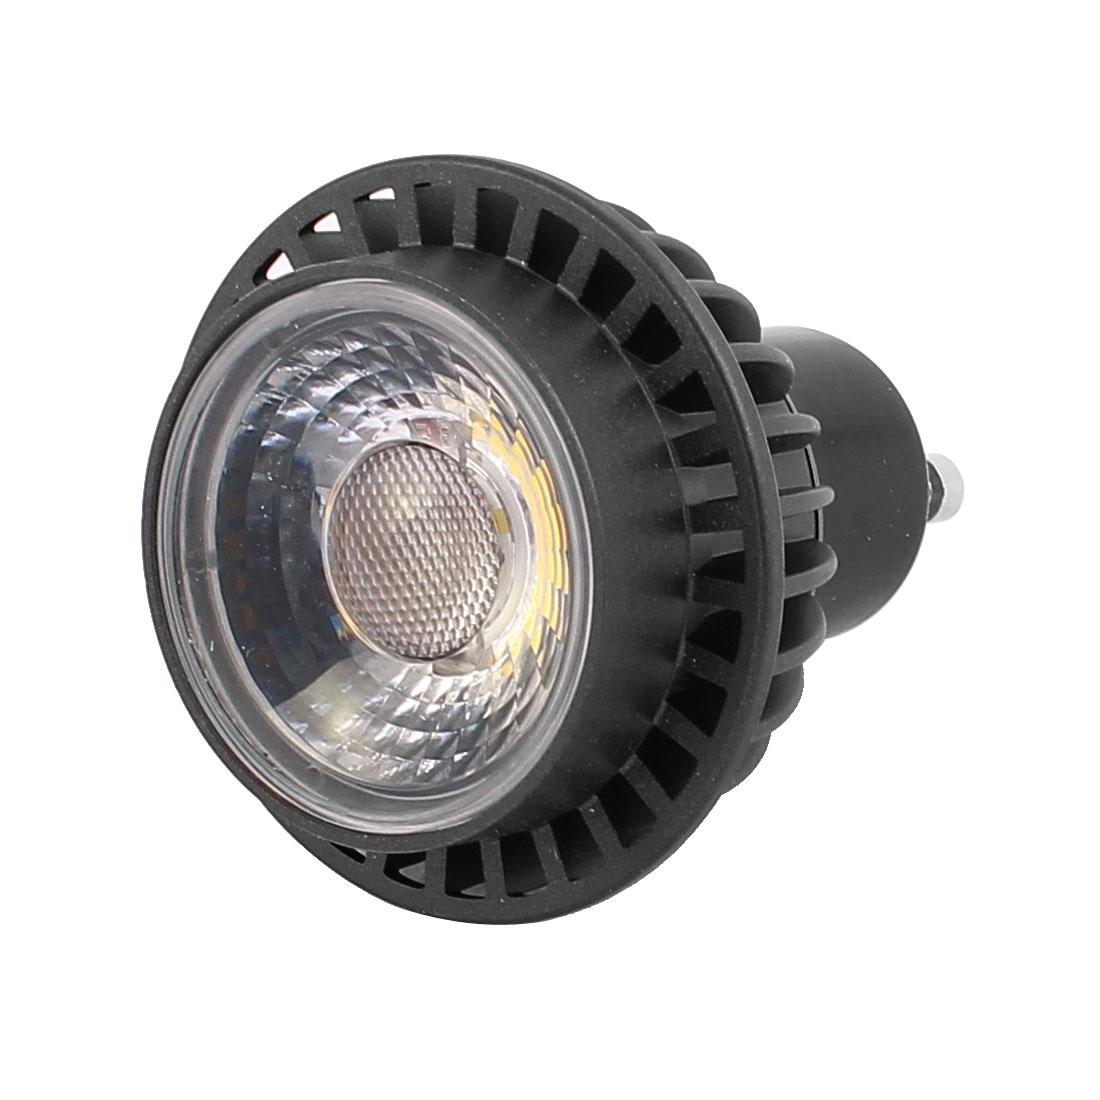 AC85-265V 3W GU10 COB LED Spotlight Lamp Bulb Downlight Cylinder Pure White